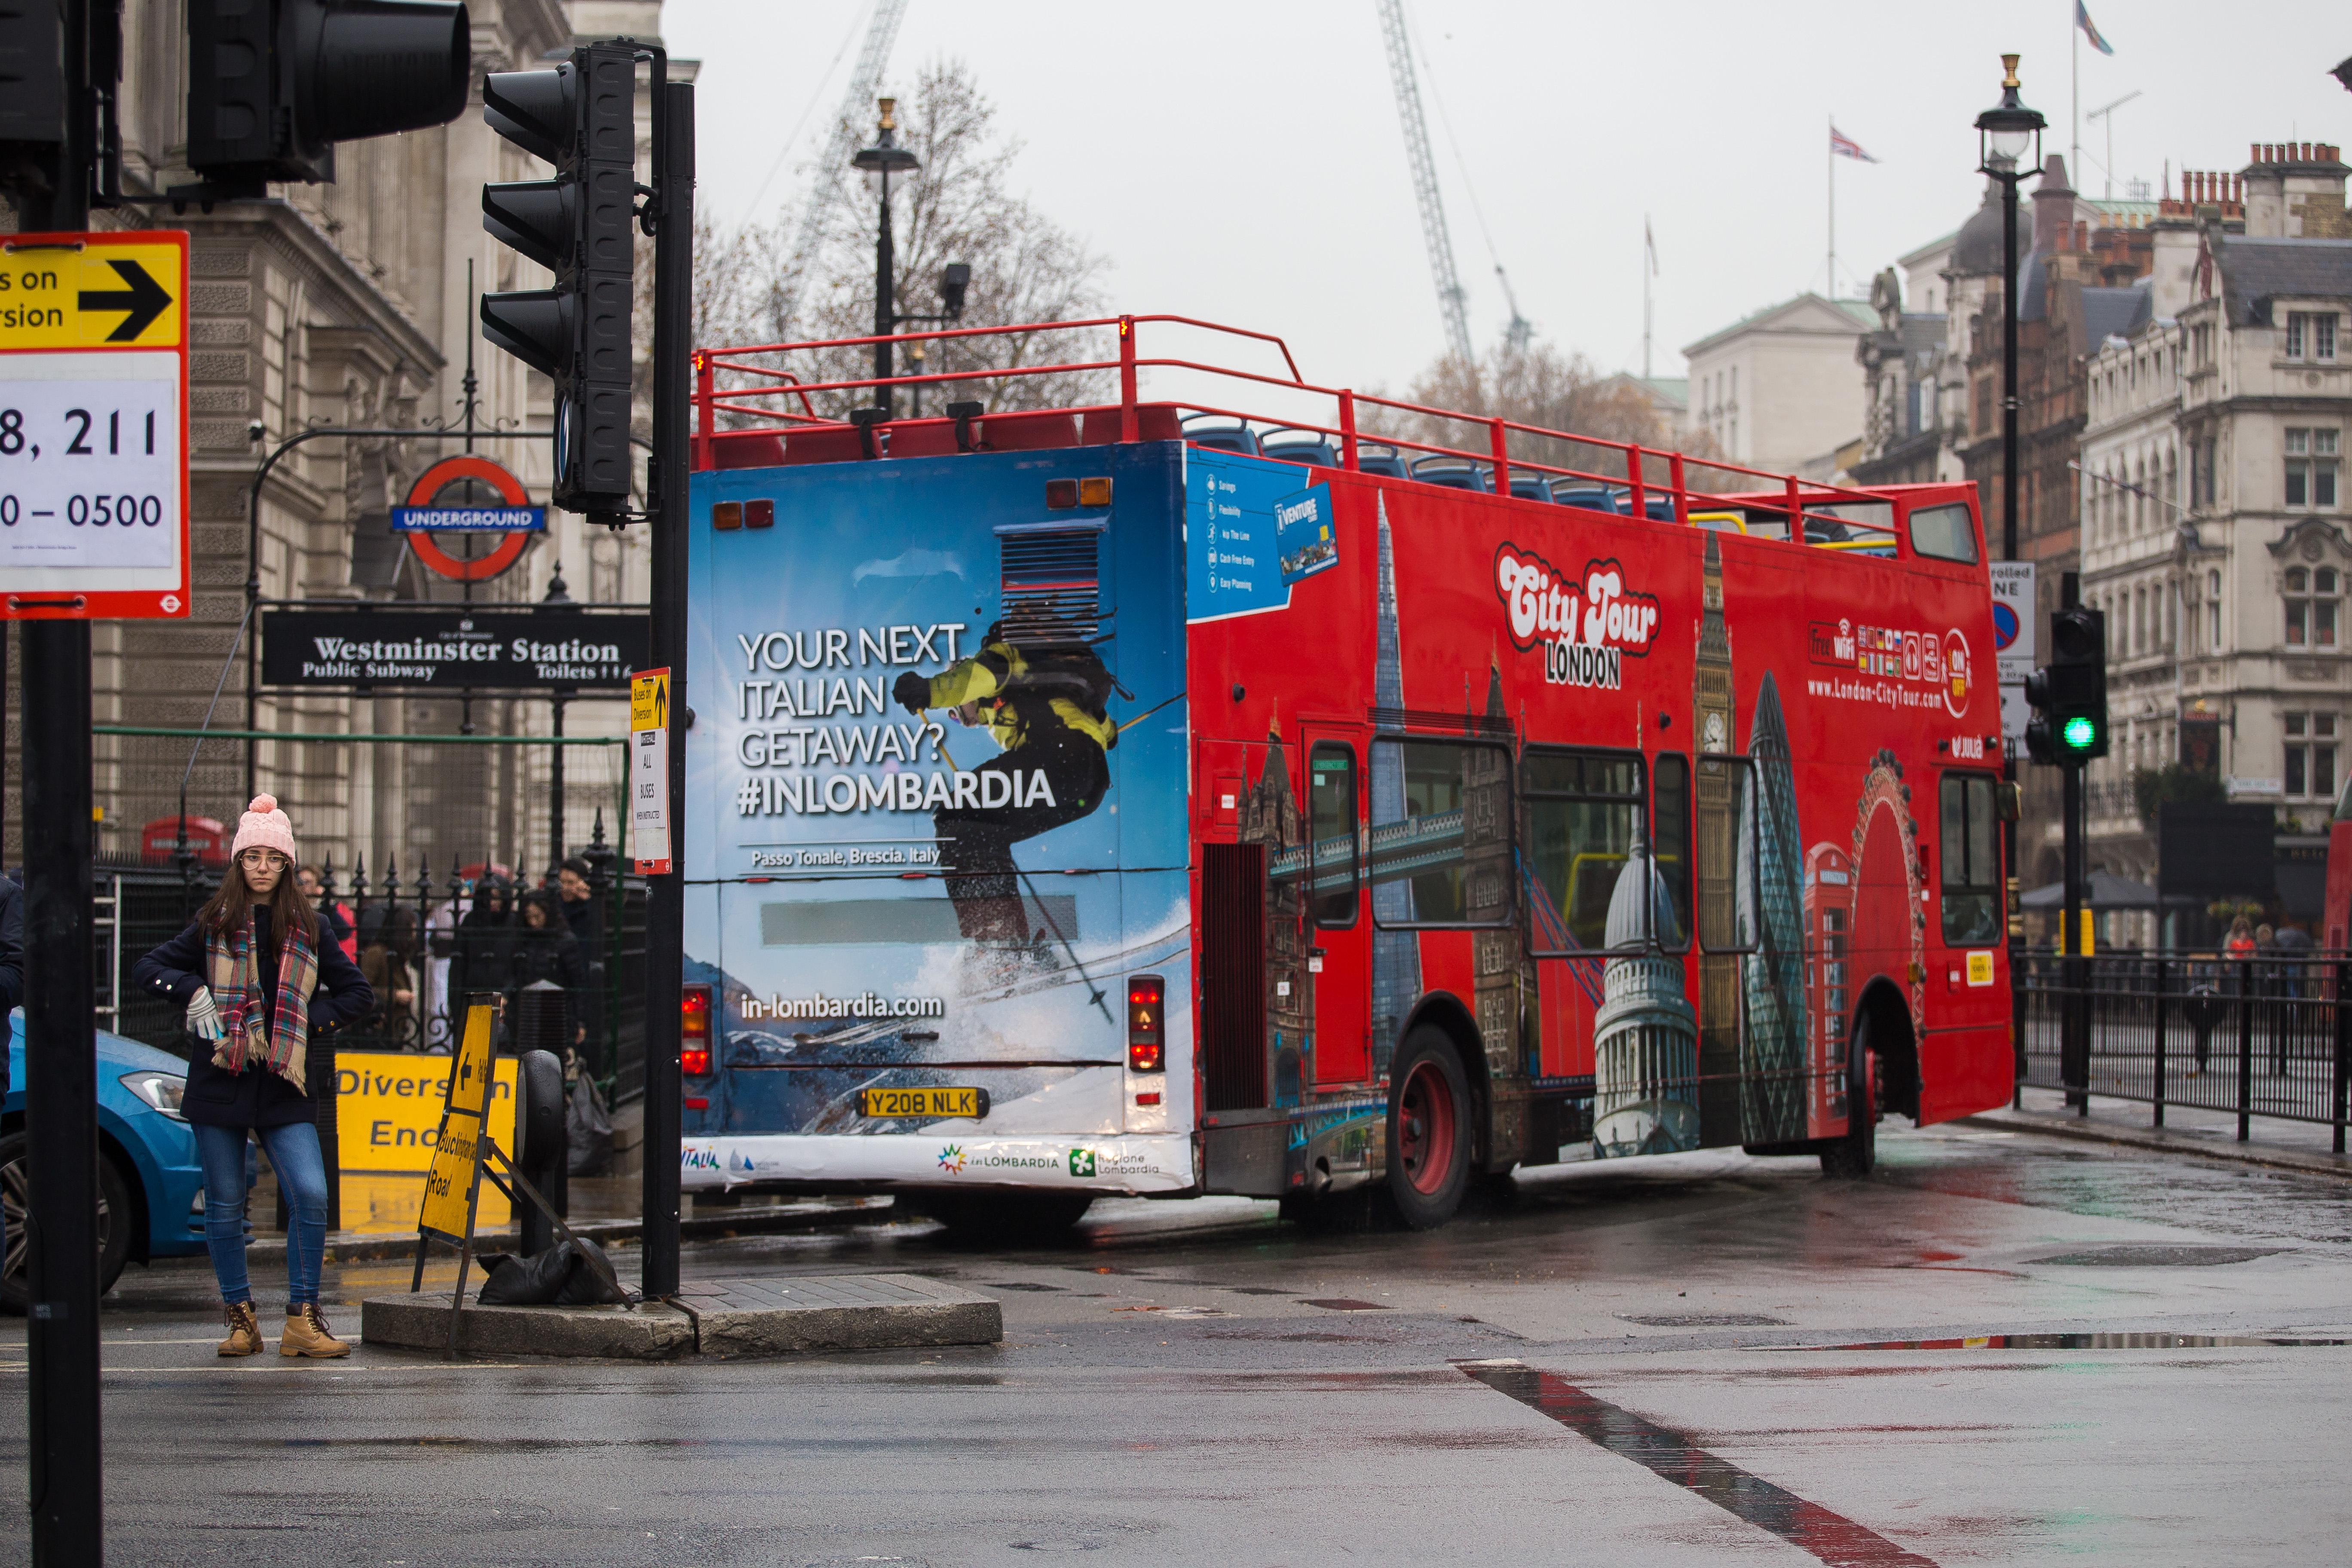 #inLombardia sui BUS di Londra